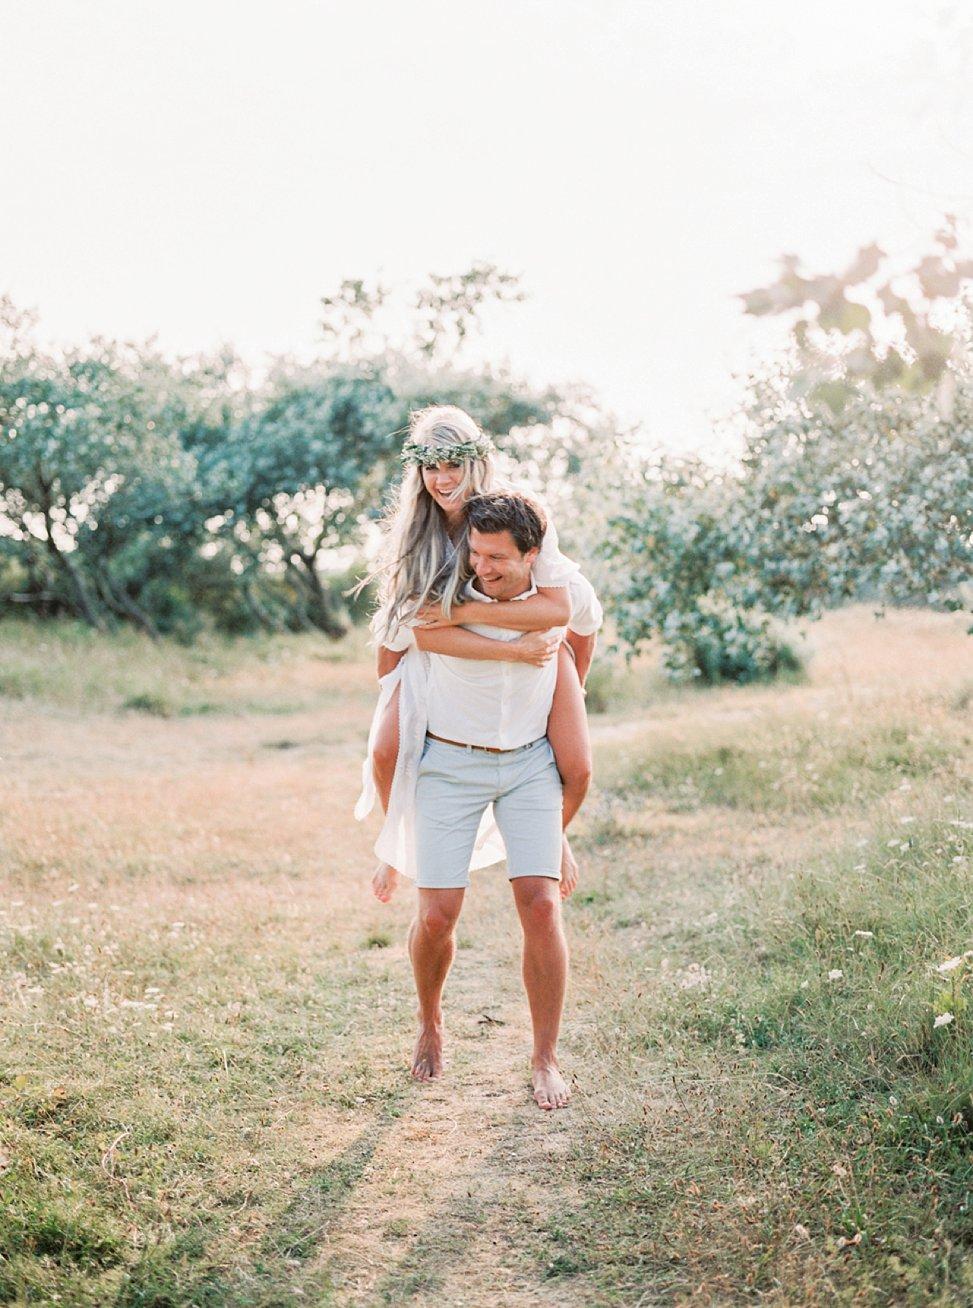 Amanda-Drost-Fotografie-fine-art-liefde-trouwen-italie_0006.jpg